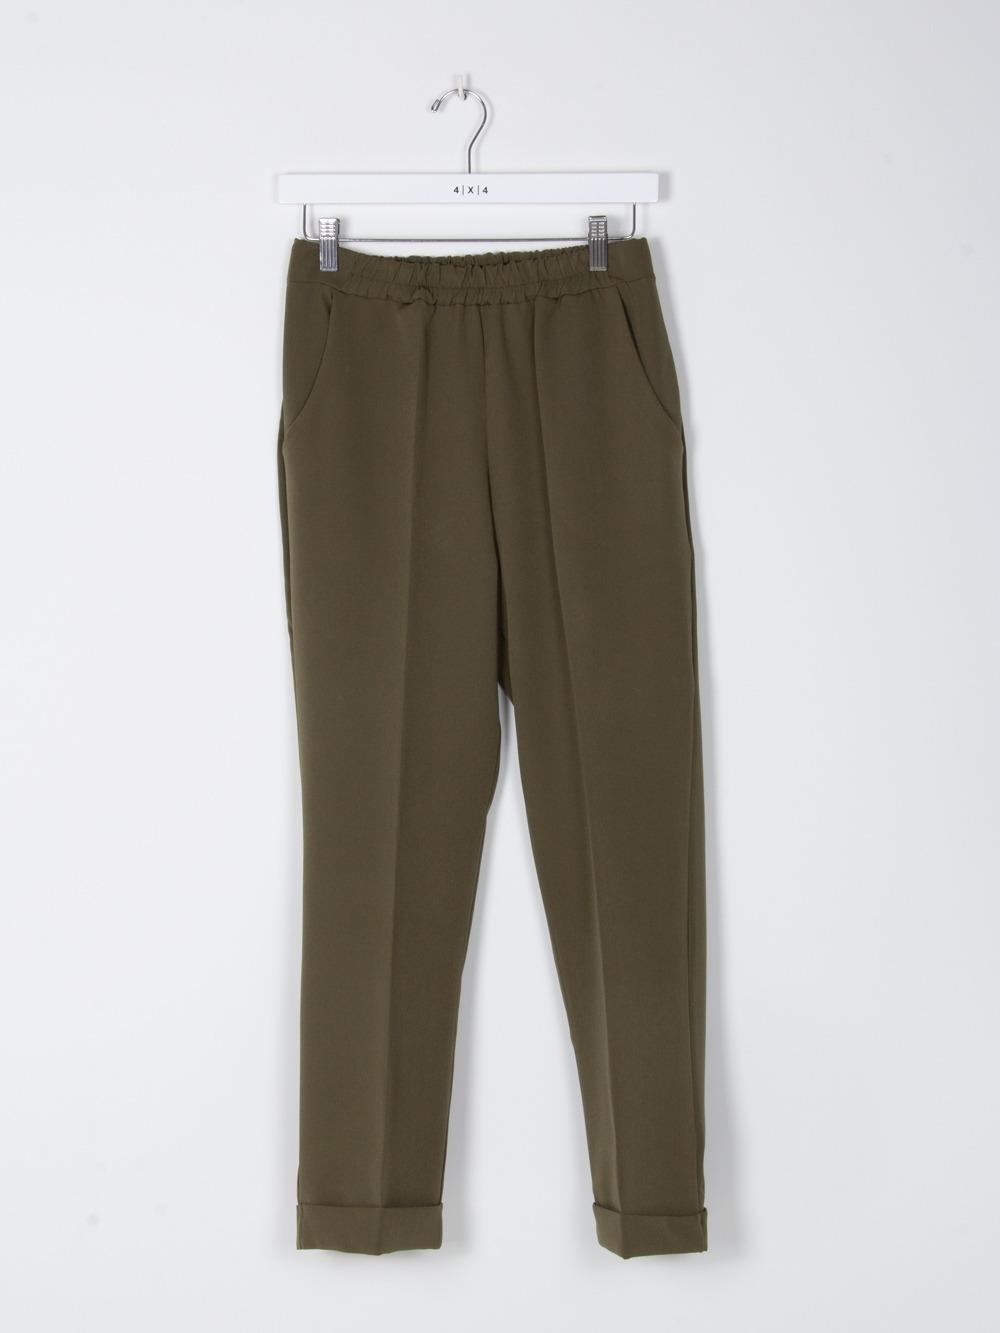 Woman wide leg elastic waist trousers Khaki